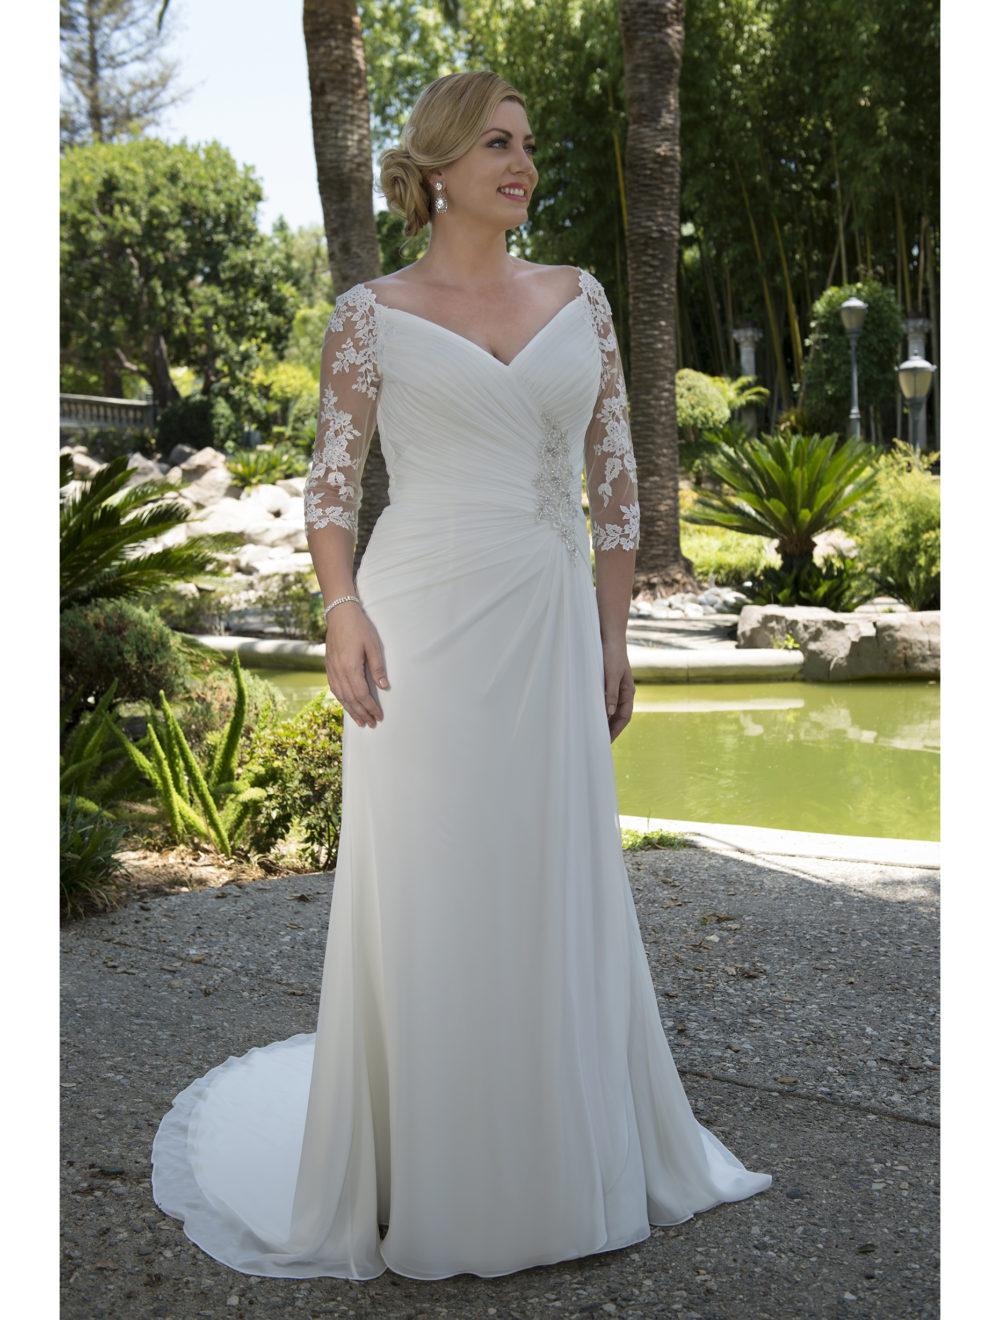 Plus Size Informal Modest Wedding Dresses 2017 Ruched Long A line Lace Chiffon Reception Bridal